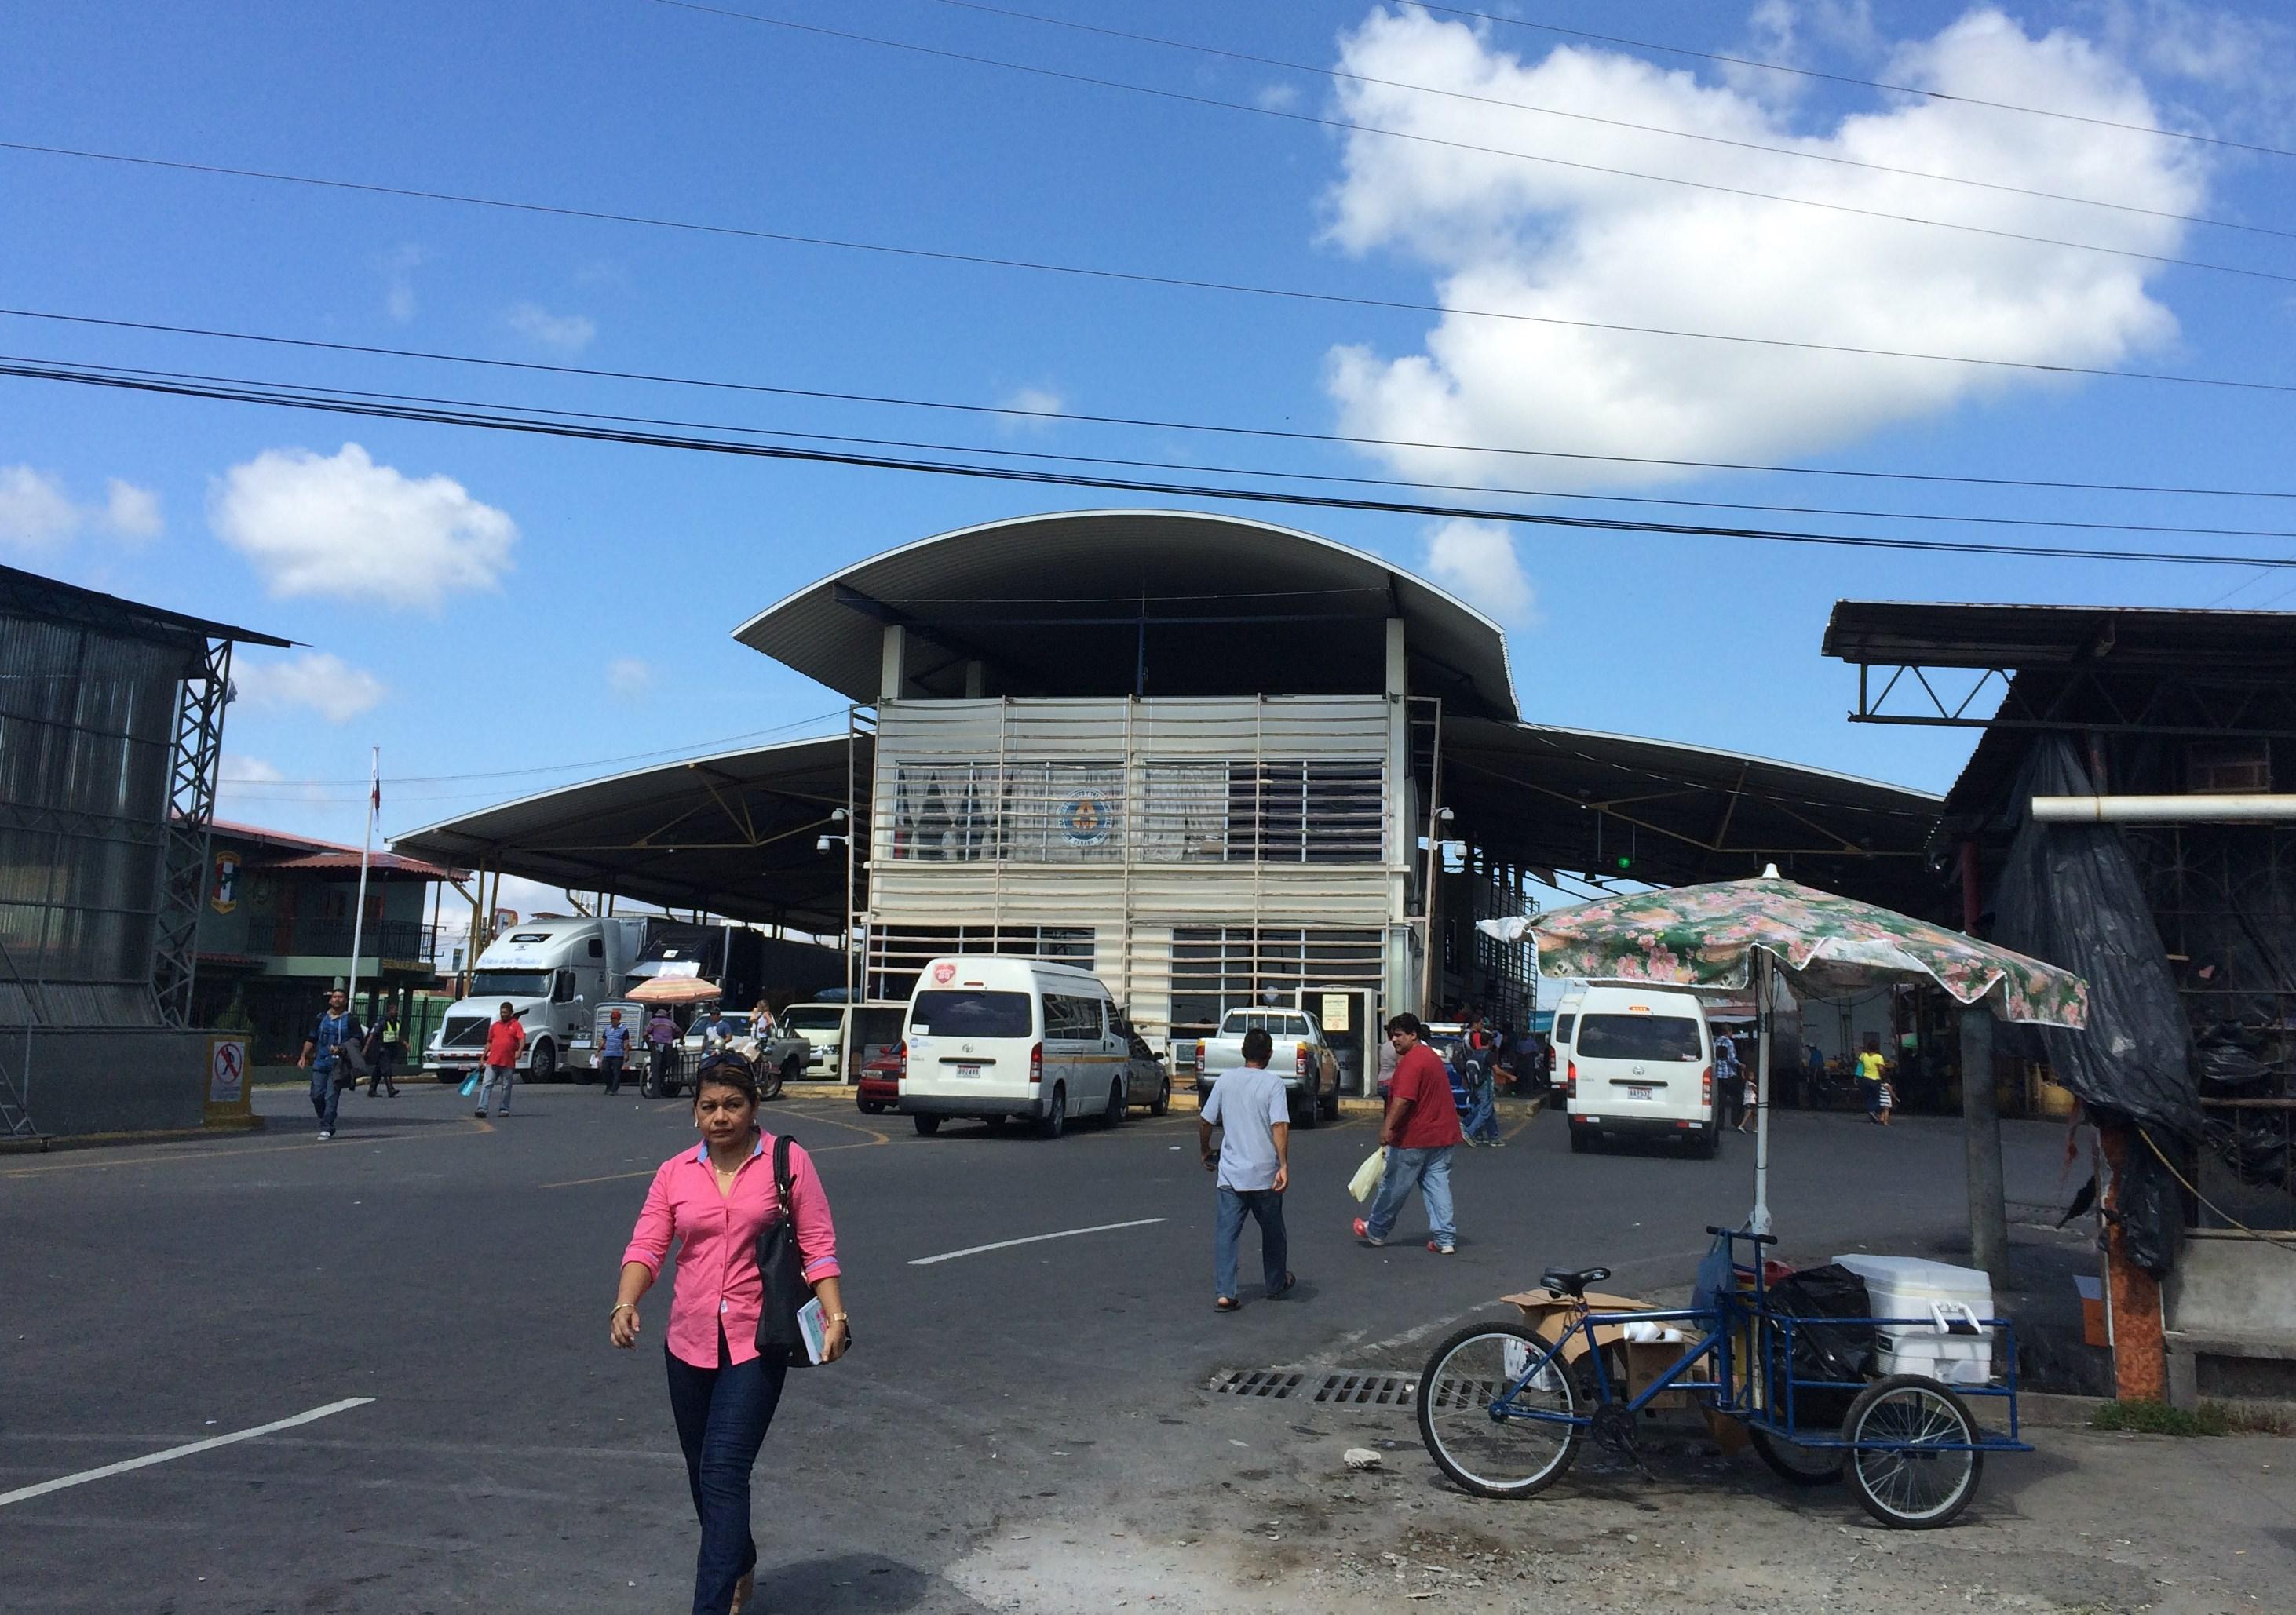 img_1054 Border Run #3 - A Quickie Panama The Expat Life